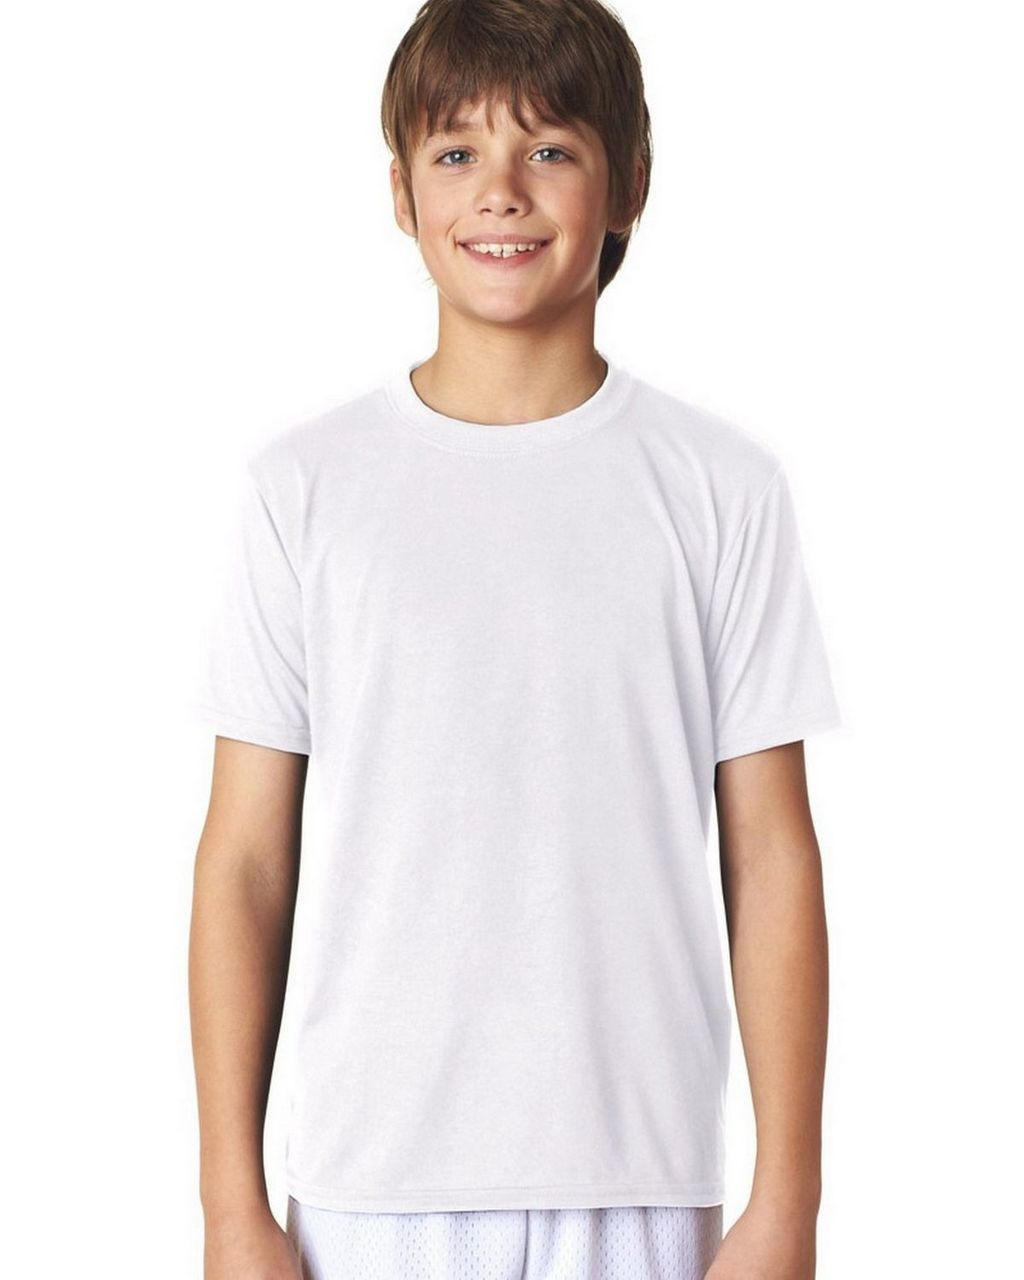 42000B Gildan Youth Polyester Performance Tee  | T-shirt.ca